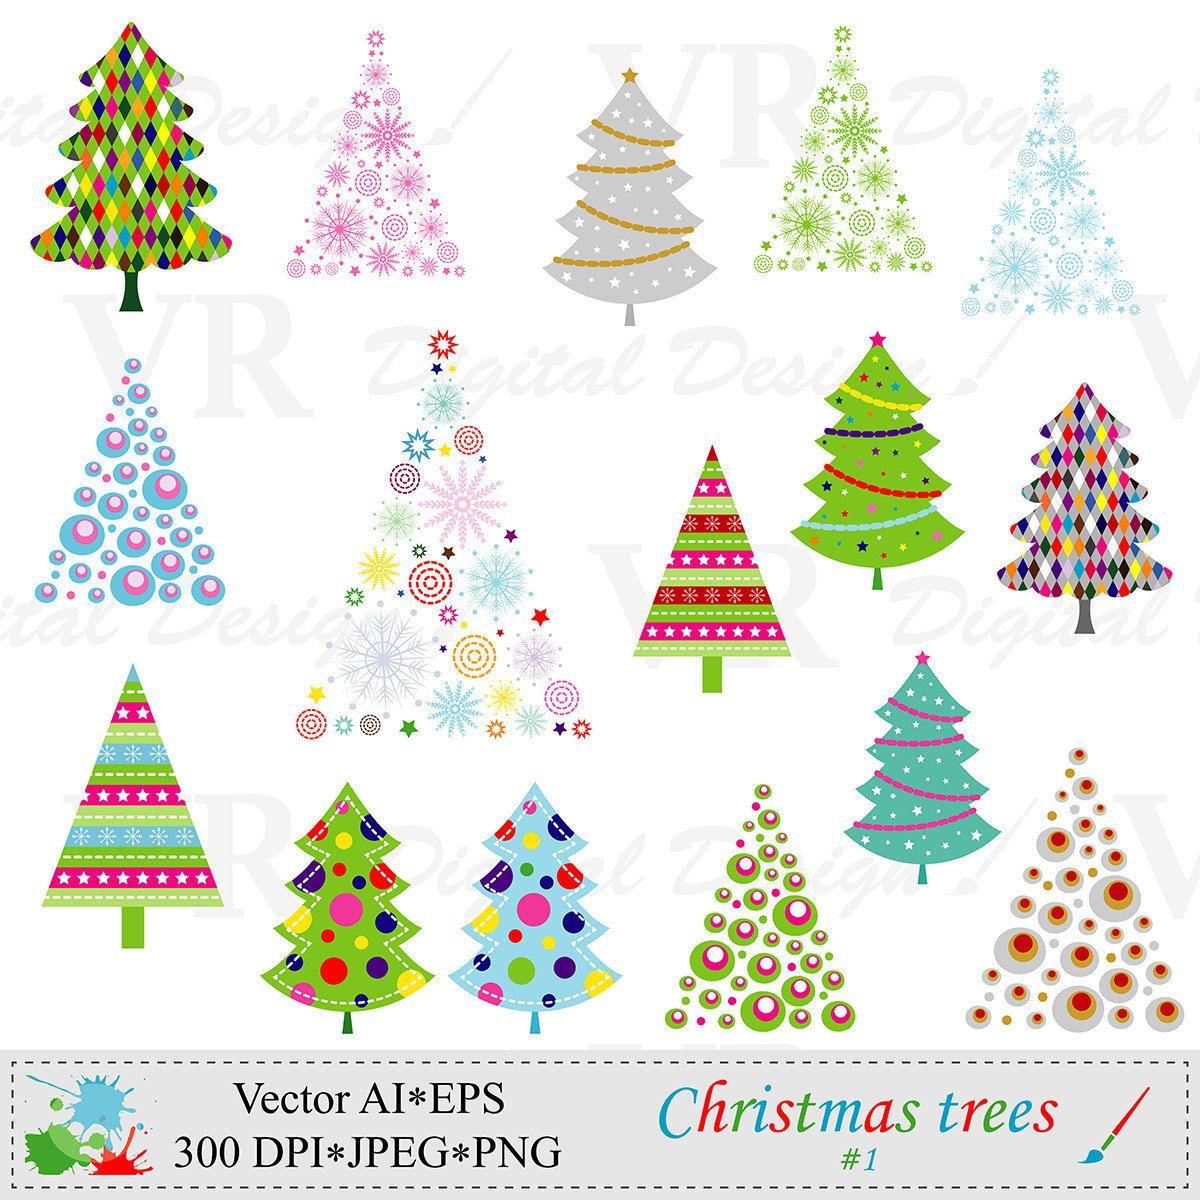 Christmas Trees Clip Art Christmas Clipart Vector Digital Etsy Christmas Tree Clipart Christmas Clipart Holiday Decor Christmas